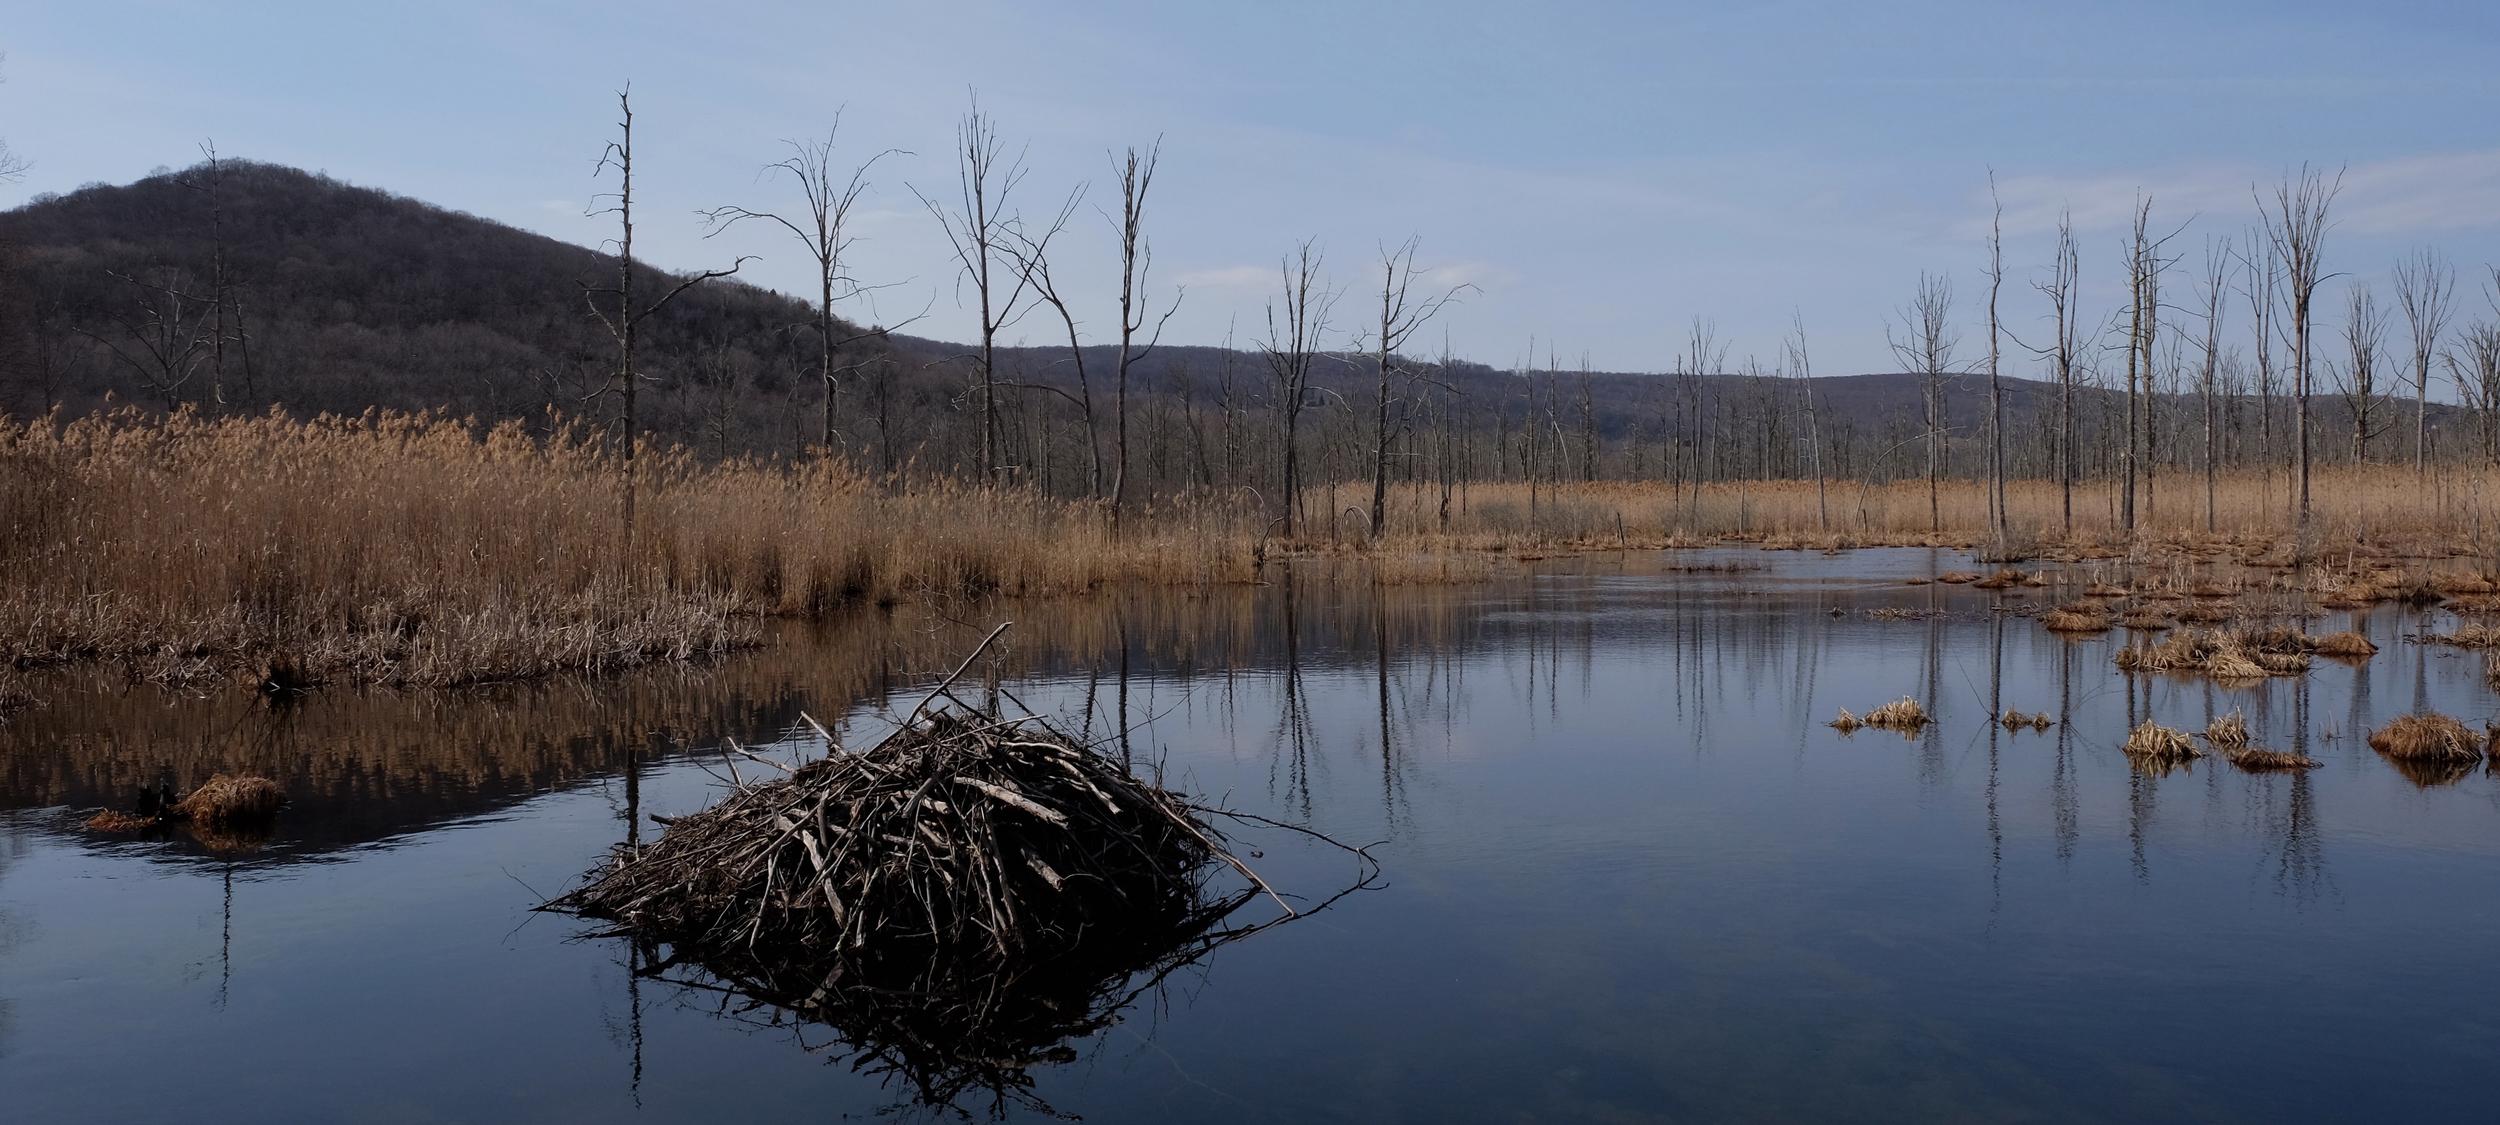 Beaver's Dam